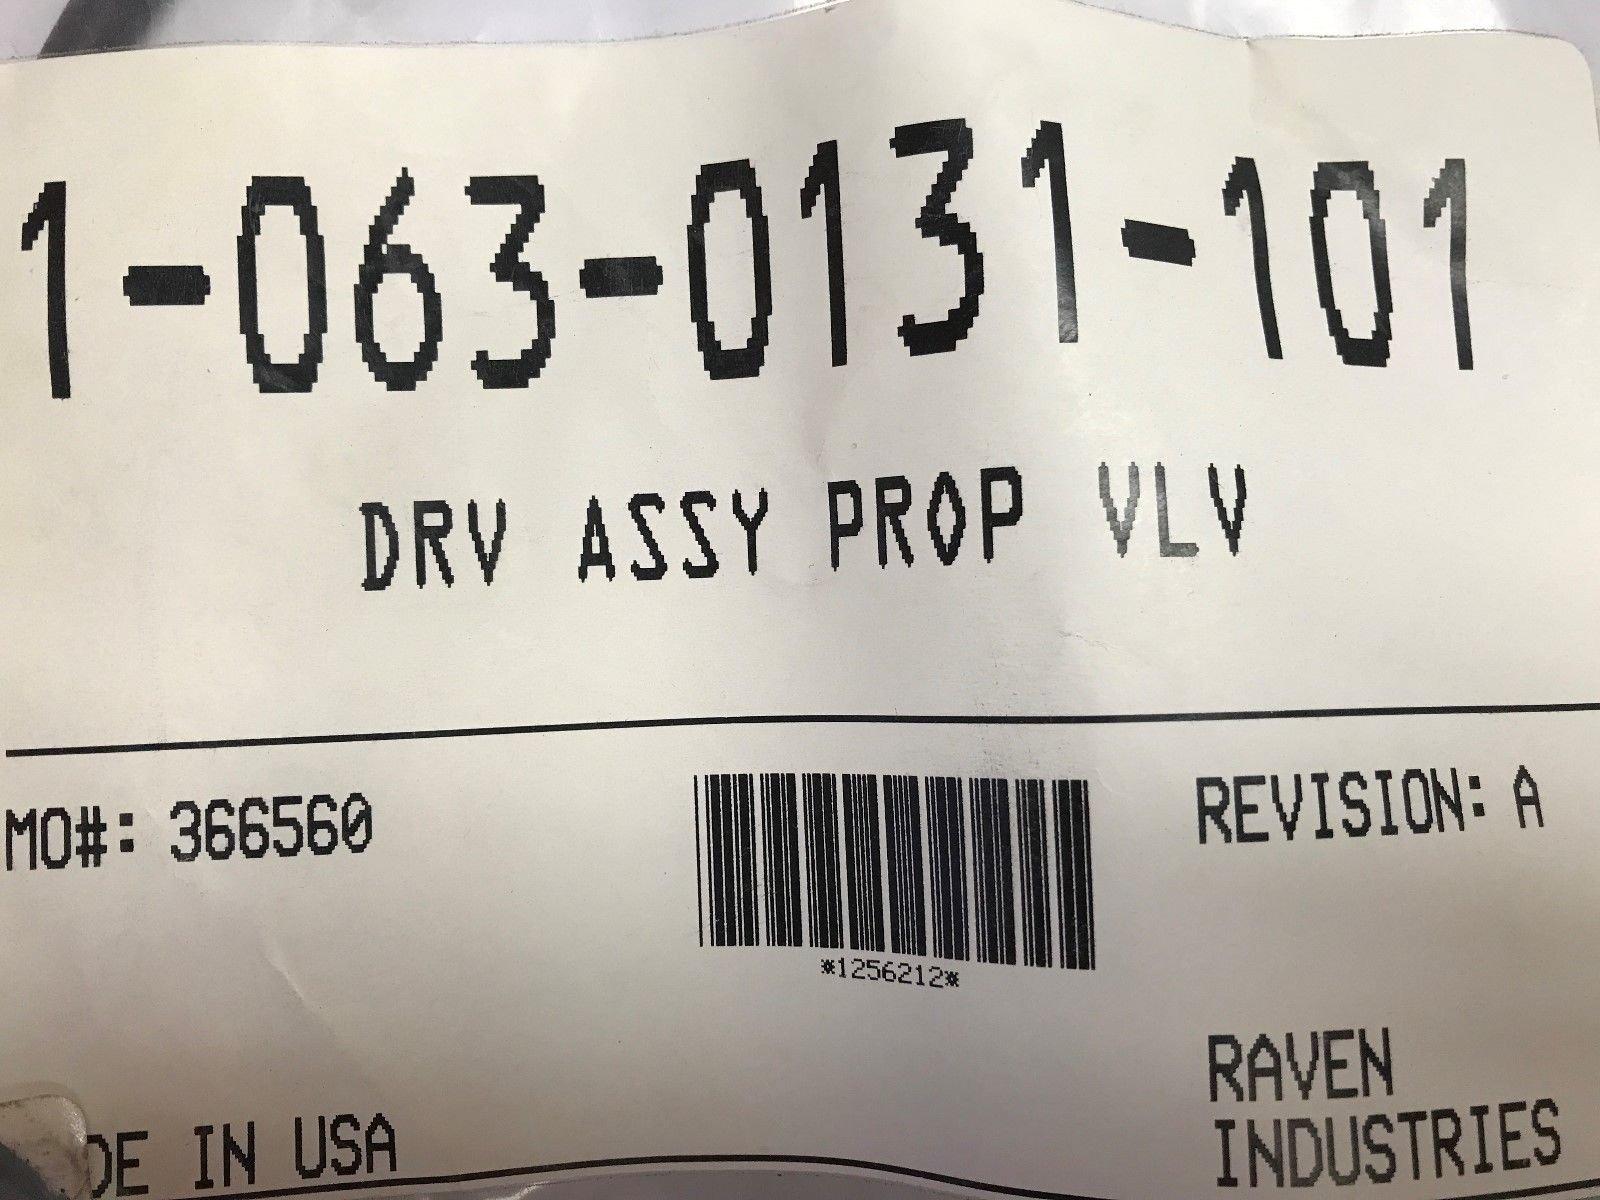 Raven 063-0131-101 Drive Assembly Prop Valve G1 Autoboom